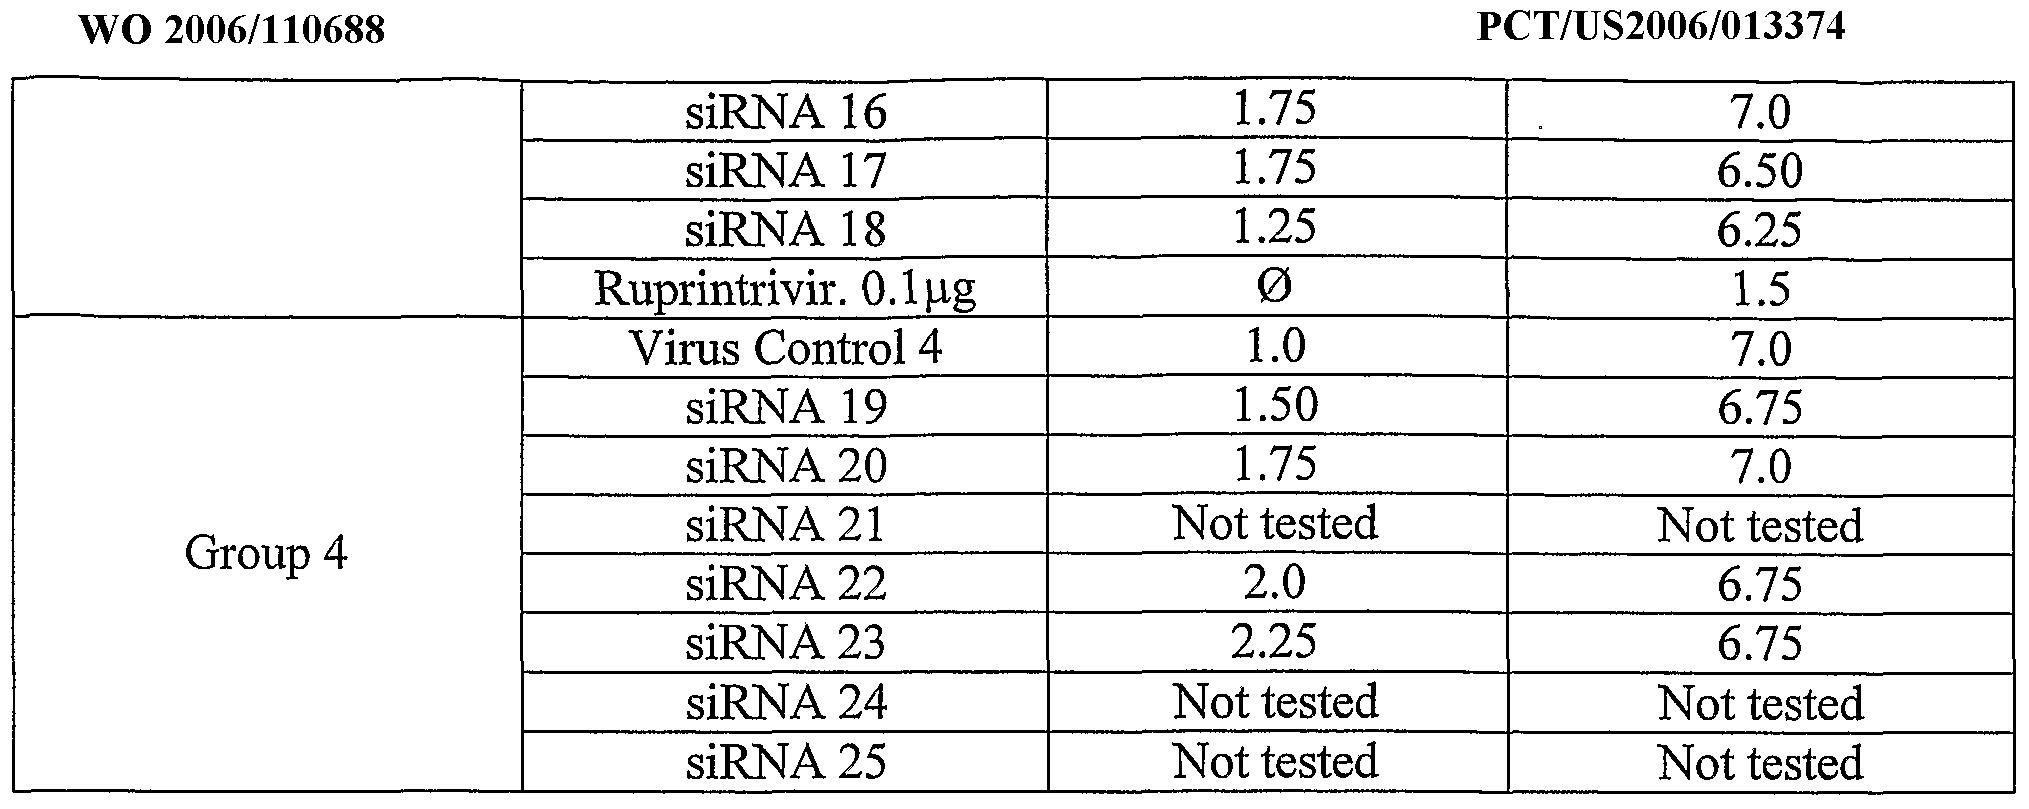 WO2006110688A9 - Rnai therapeutic for respiratory virus